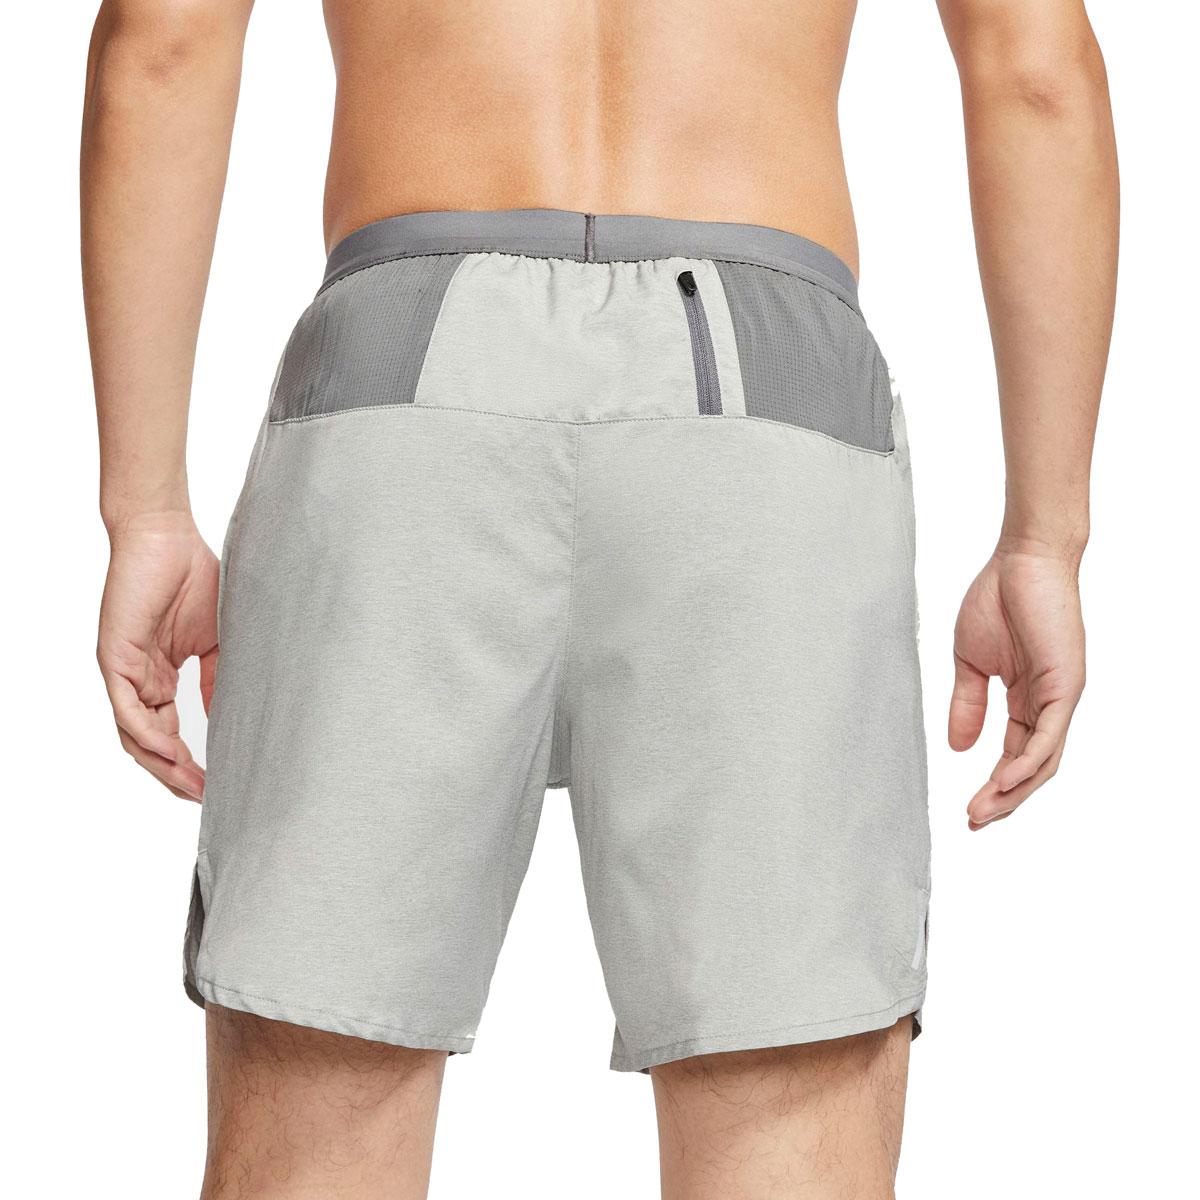 "Men's Nike Flex Stride 7"" Brief Running Shorts - Color: Iron Grey/Heather/Reflective Silver - Size: S, Iron Grey/Heather/Reflective Silver, large, image 2"